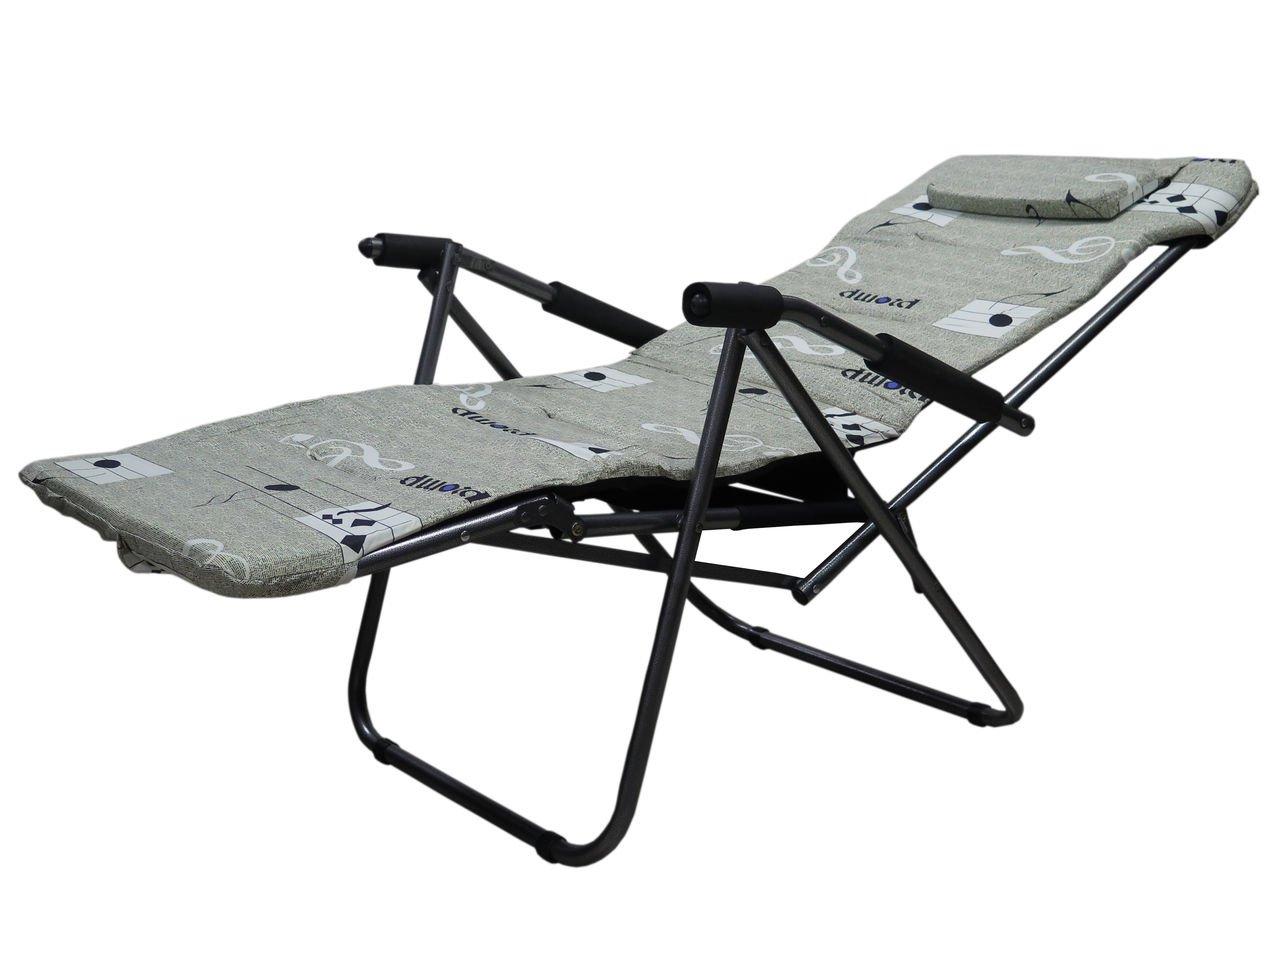 100 Nilkamal Plastic Chairs Price List In Bangalore  : 61kdc2fx8ULSL1280 from ll100proof.com size 1280 x 960 jpeg 97kB